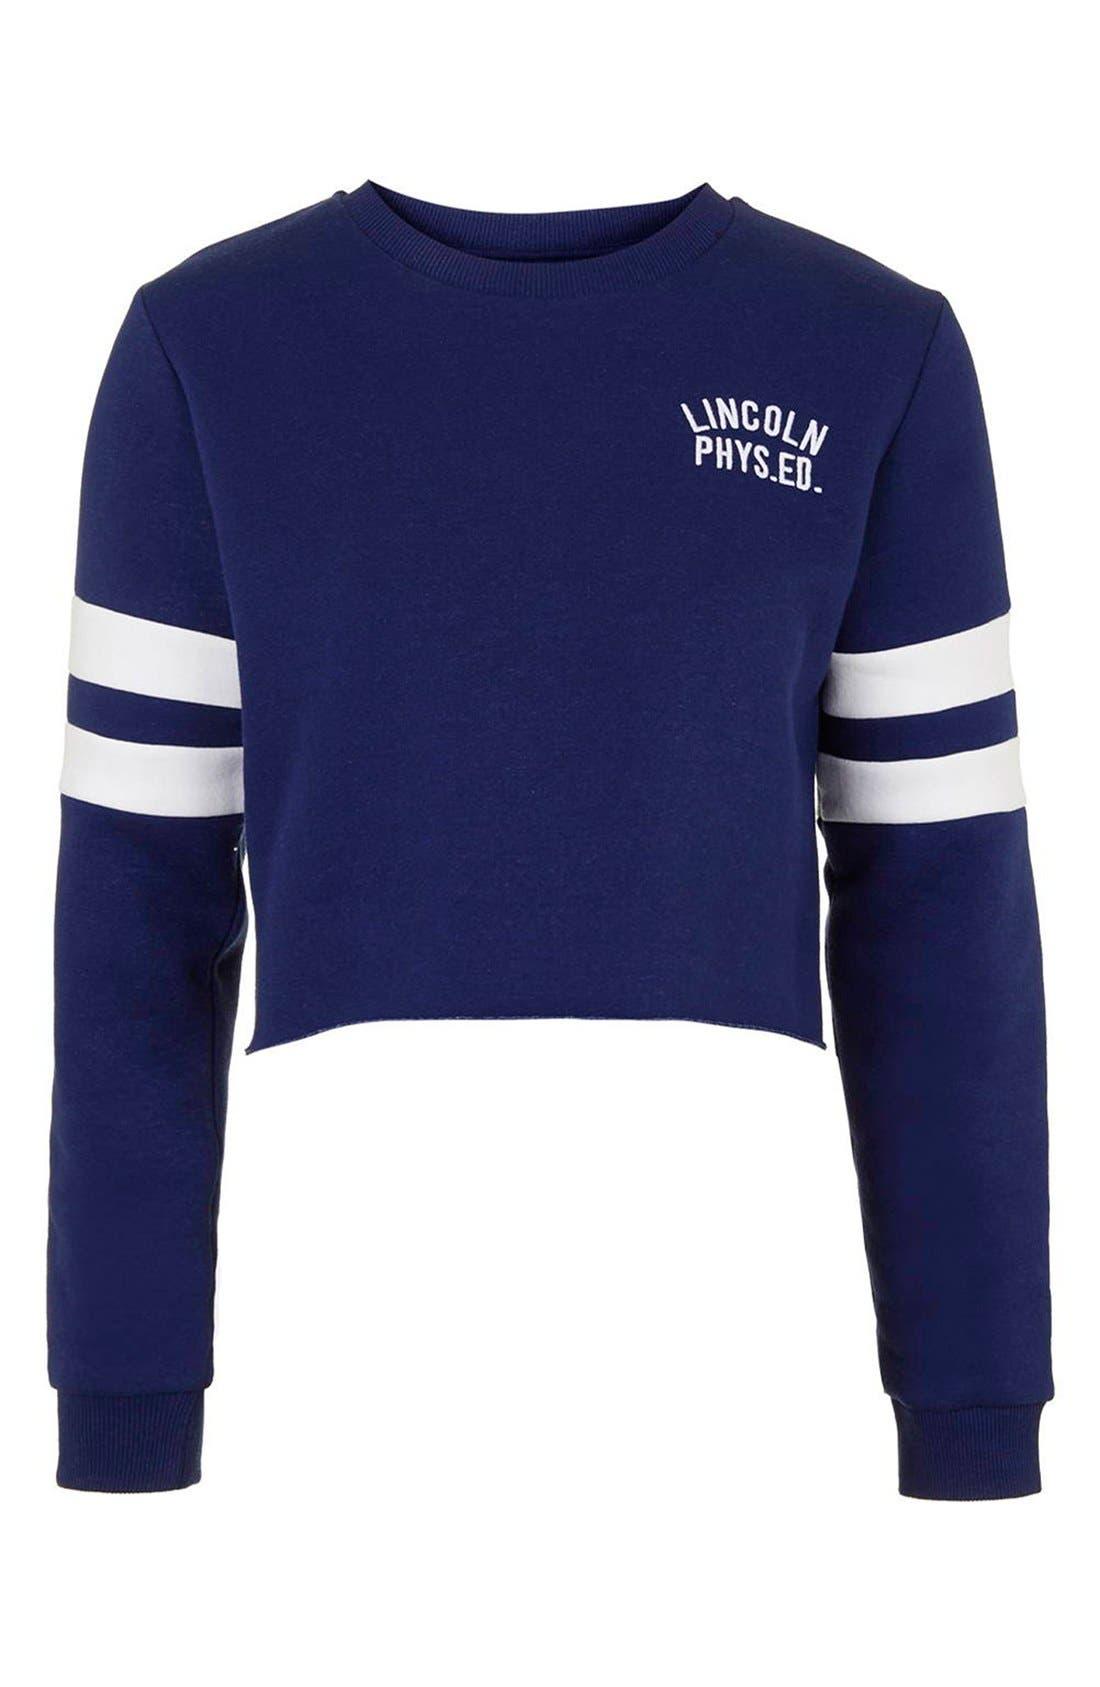 Alternate Image 4  - Topshop 'Lincoln Phys Ed' Crop Sweatshirt